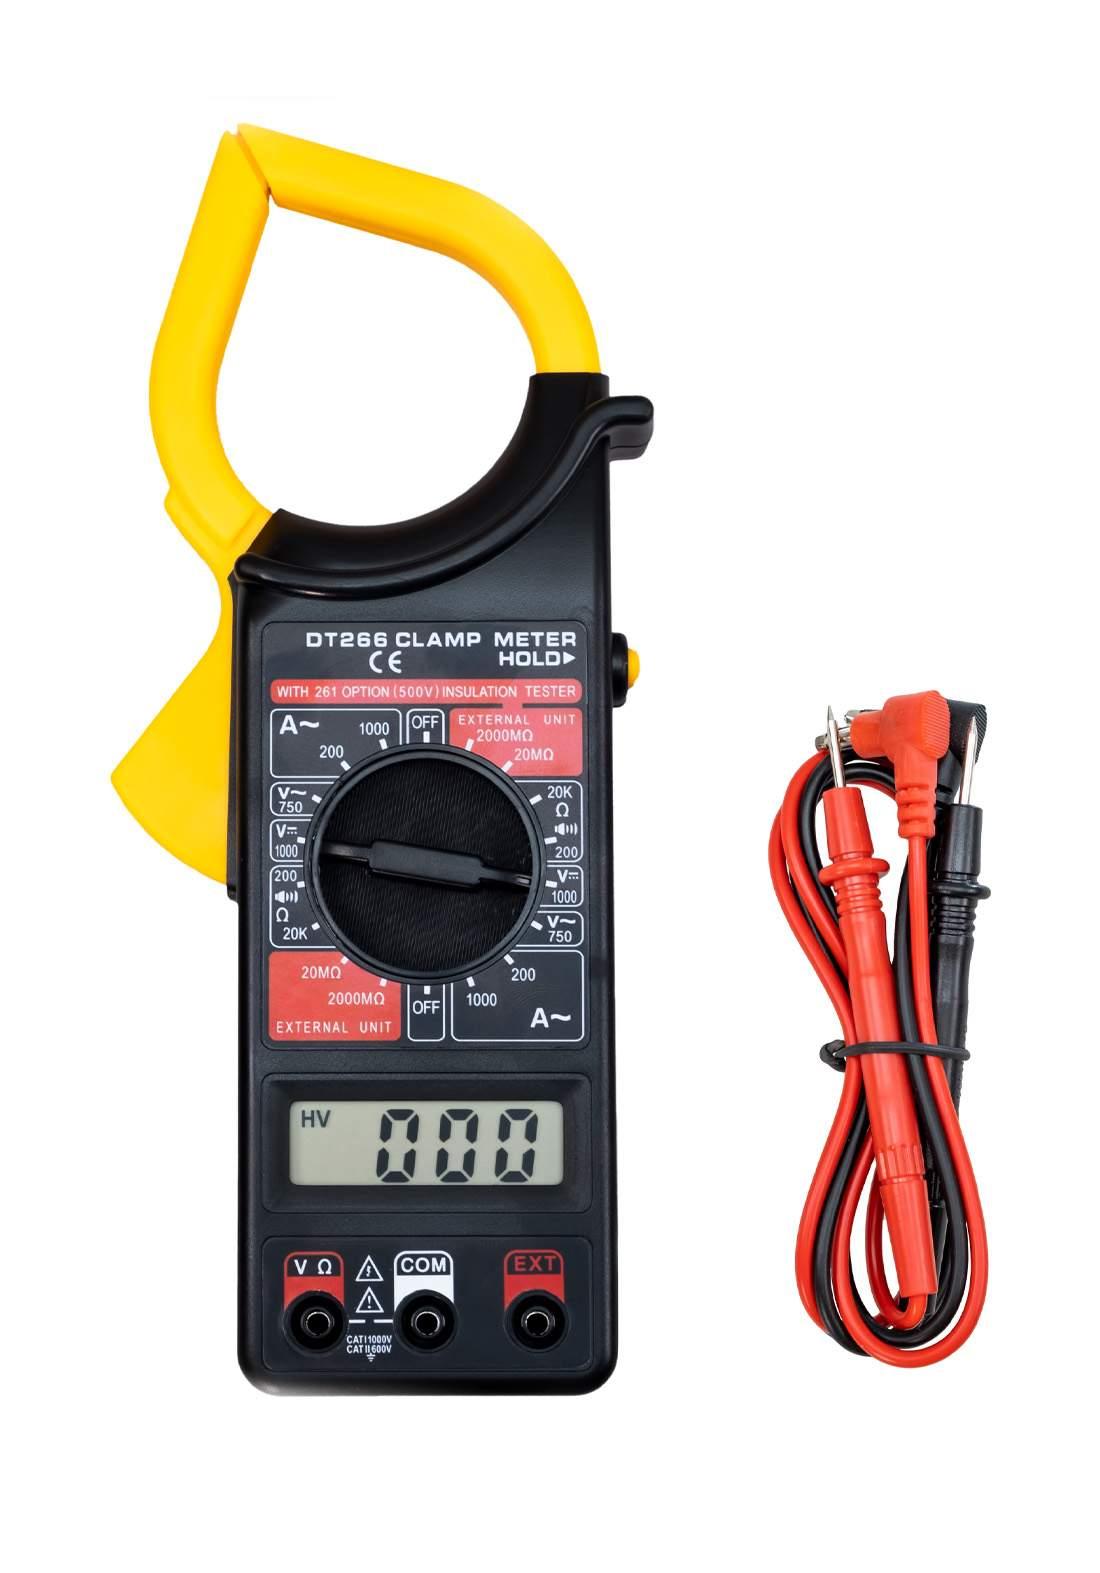 Clampmeter DT266 1000 A 1000 V جهاز قياس